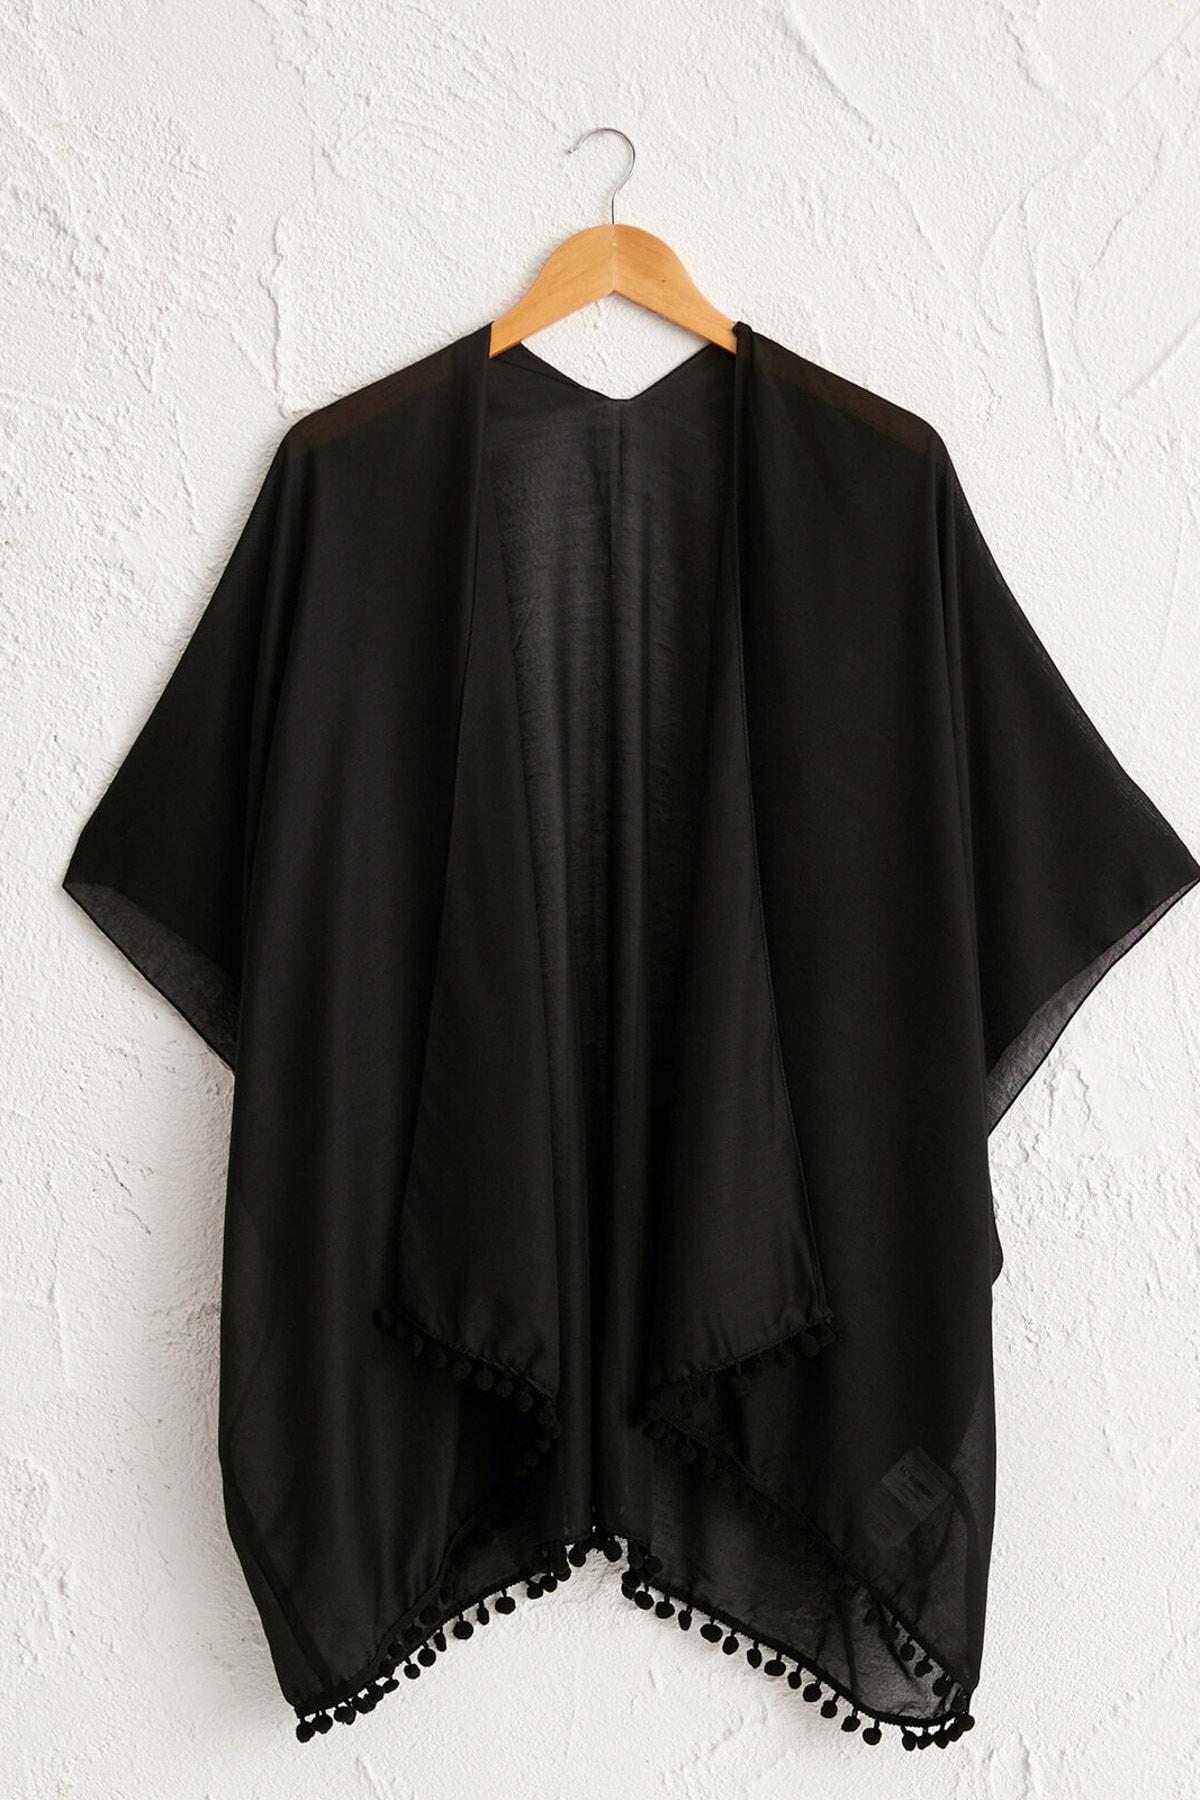 LC Waikiki Kadın Yeni Siyah Elbise 0SE625Z8 1